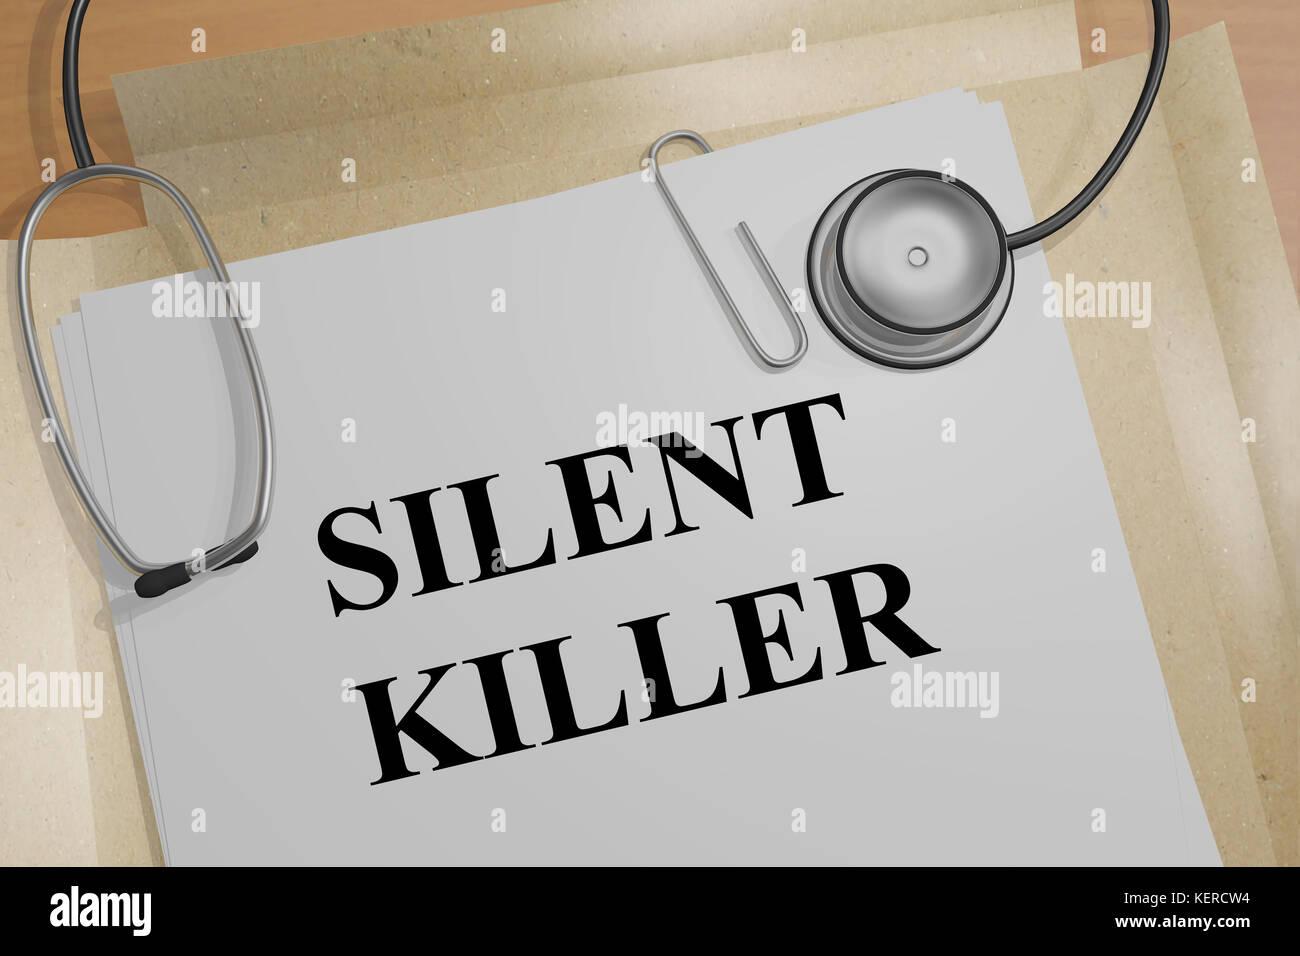 3D illustration of 'SILENT KILLER' title on a medical document - Stock Image